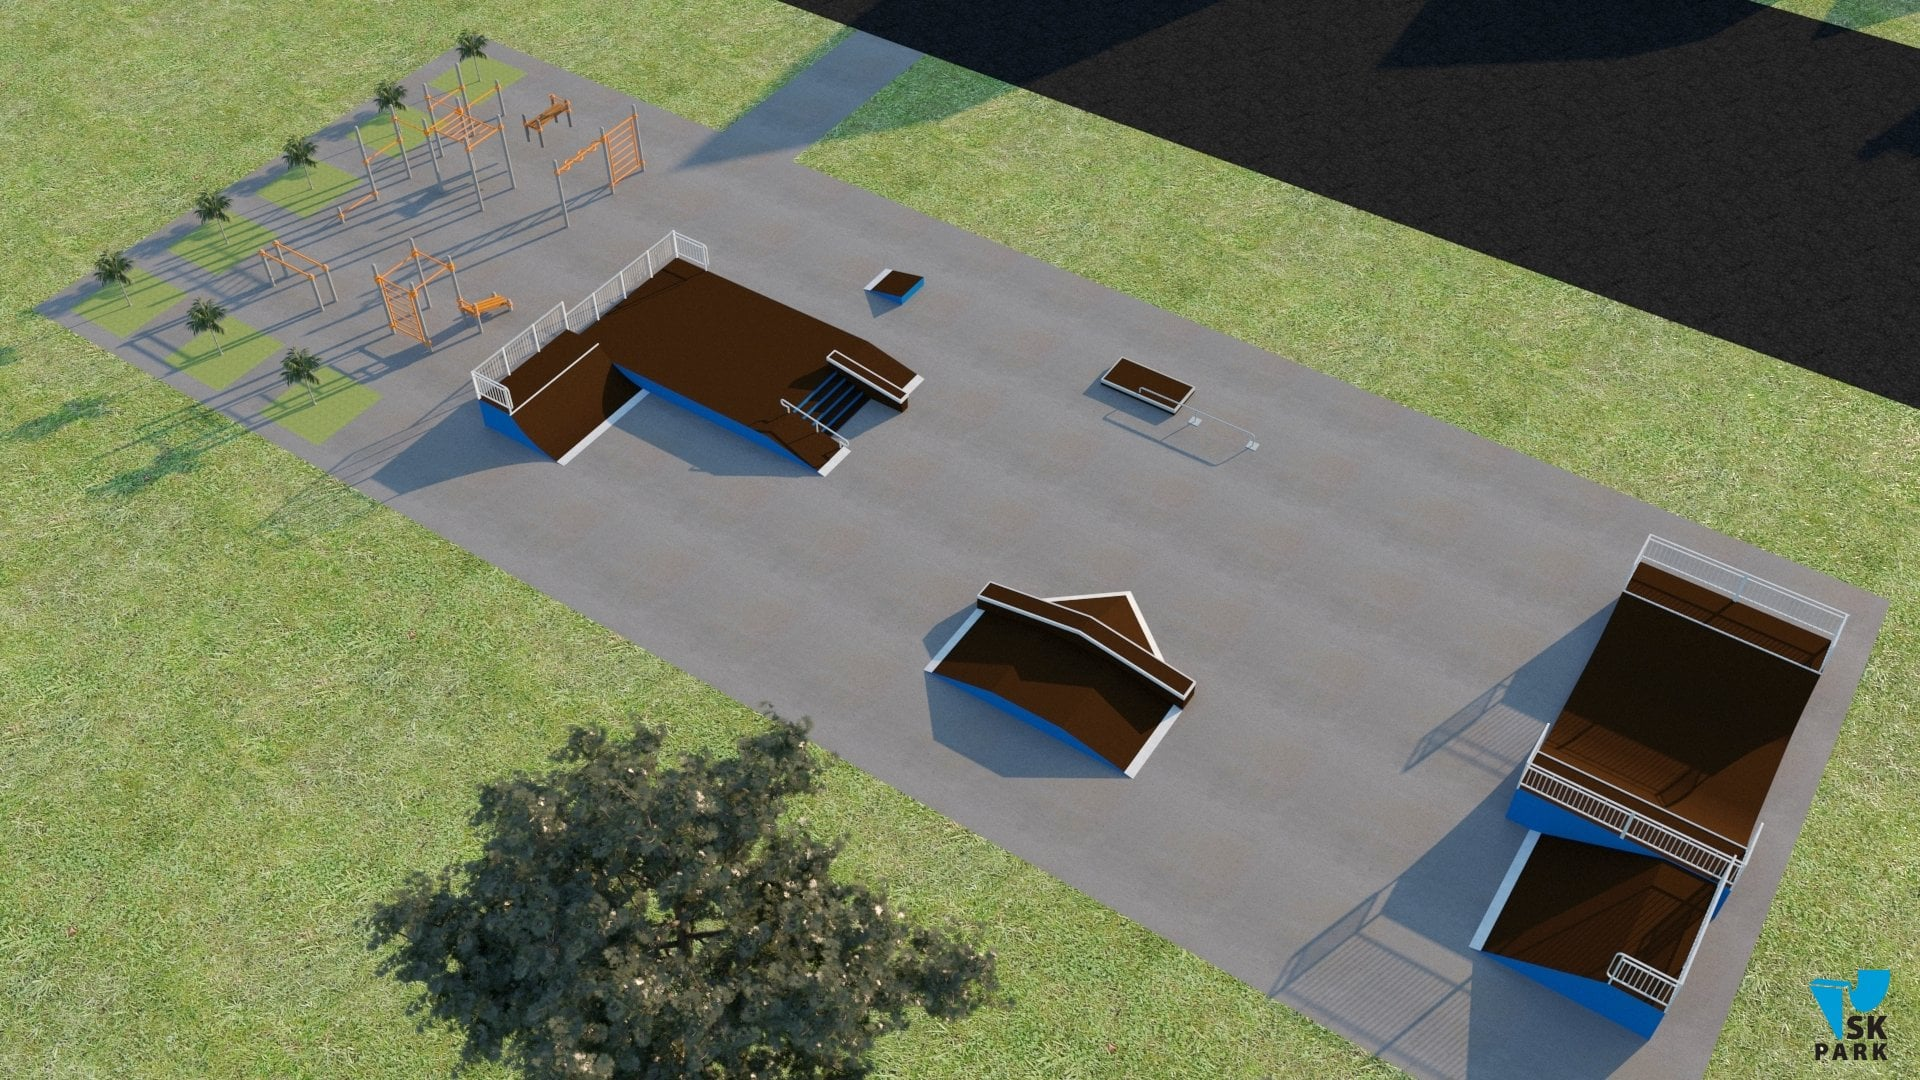 Строительство Скейт парка и воркаут площадки в Тамани